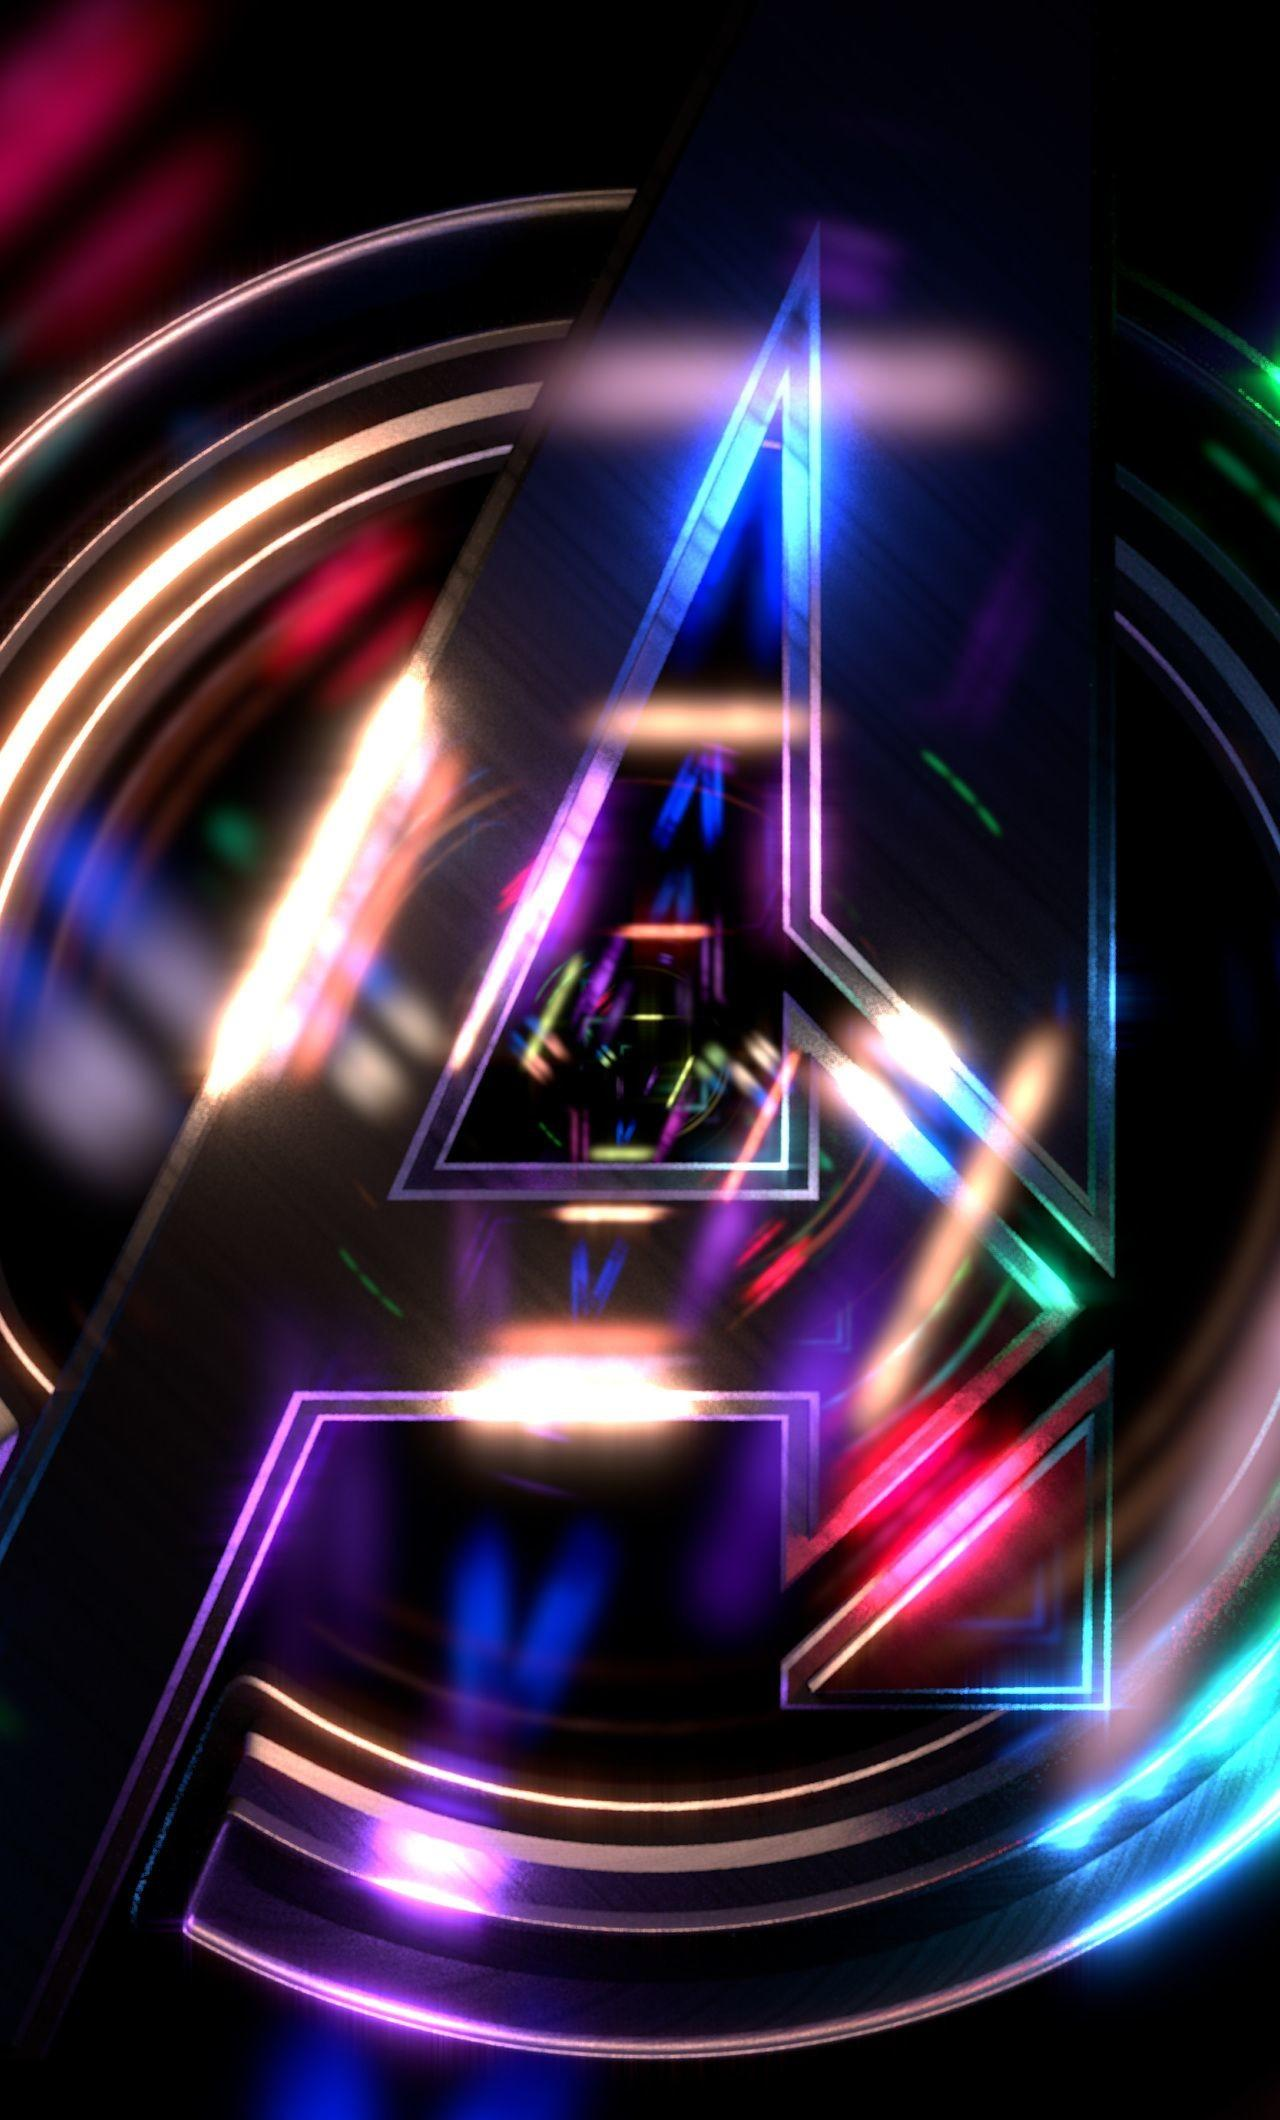 Hd Avengers Logo Phone Wallpapers Wallpaper Cave